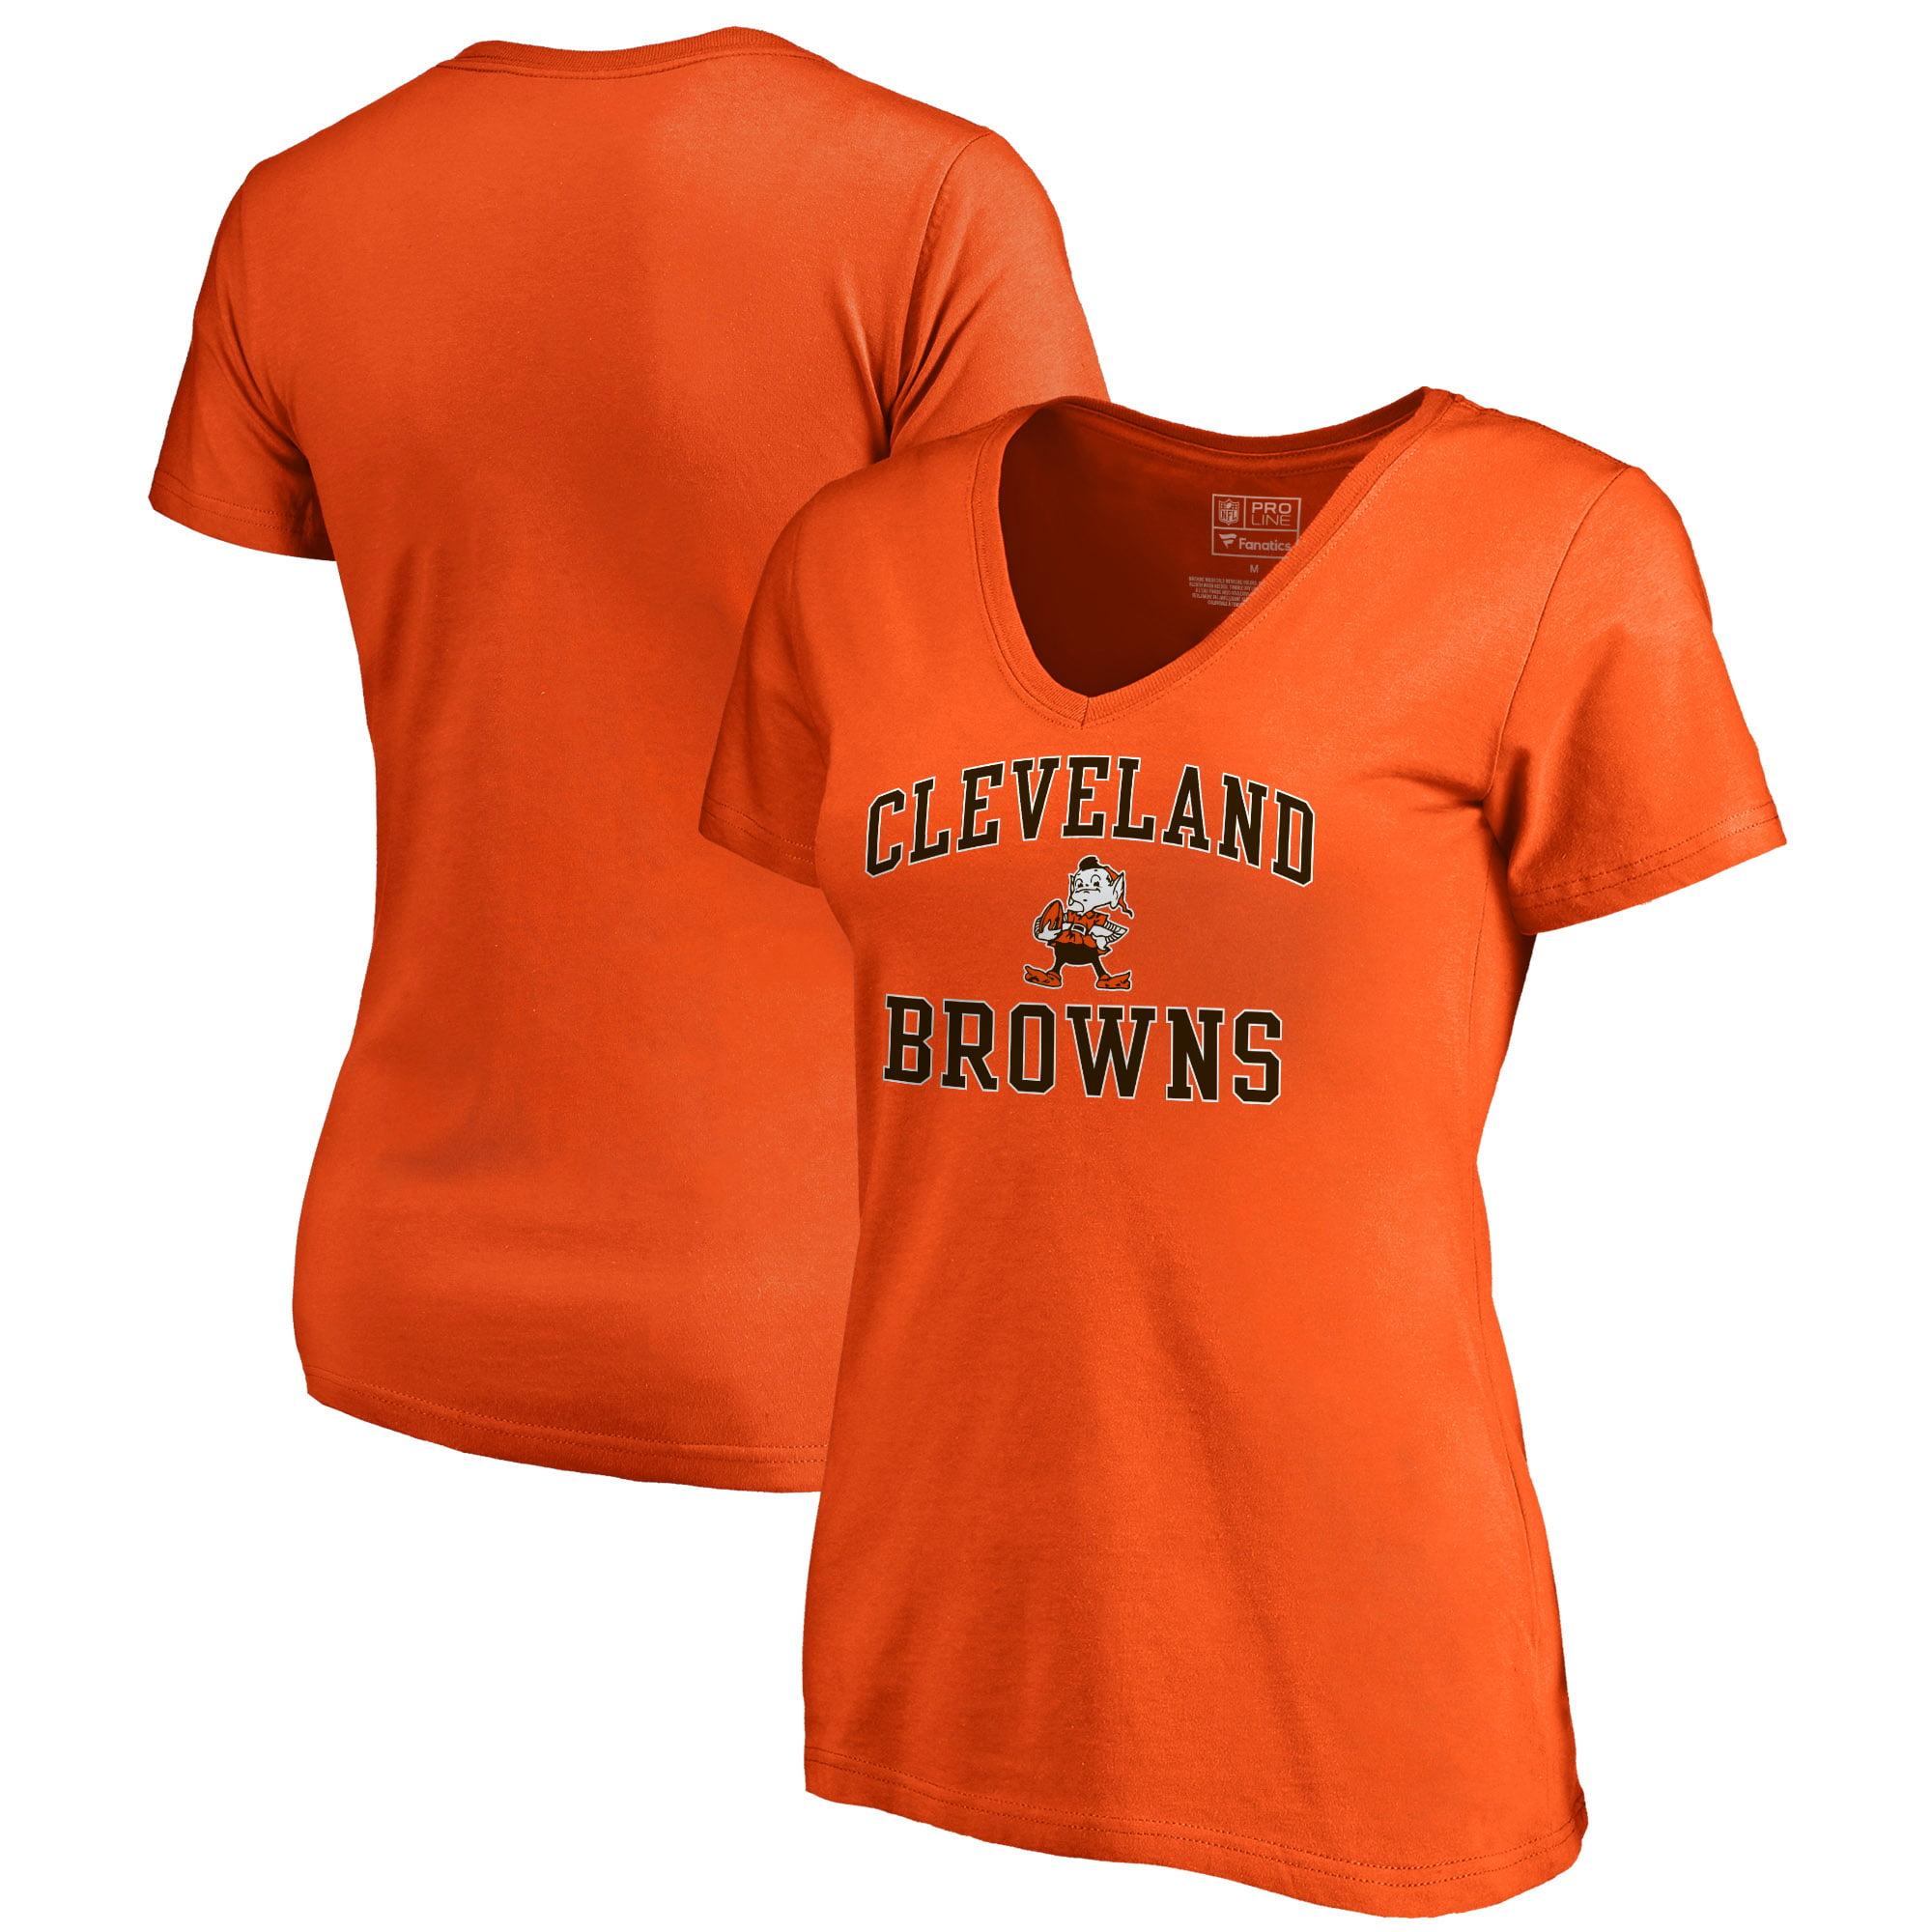 Cleveland Browns NFL Pro Line by Fanatics Branded Women's Vintage Collection Victory Arch Plus Size V-Neck T-Shirt - Orange